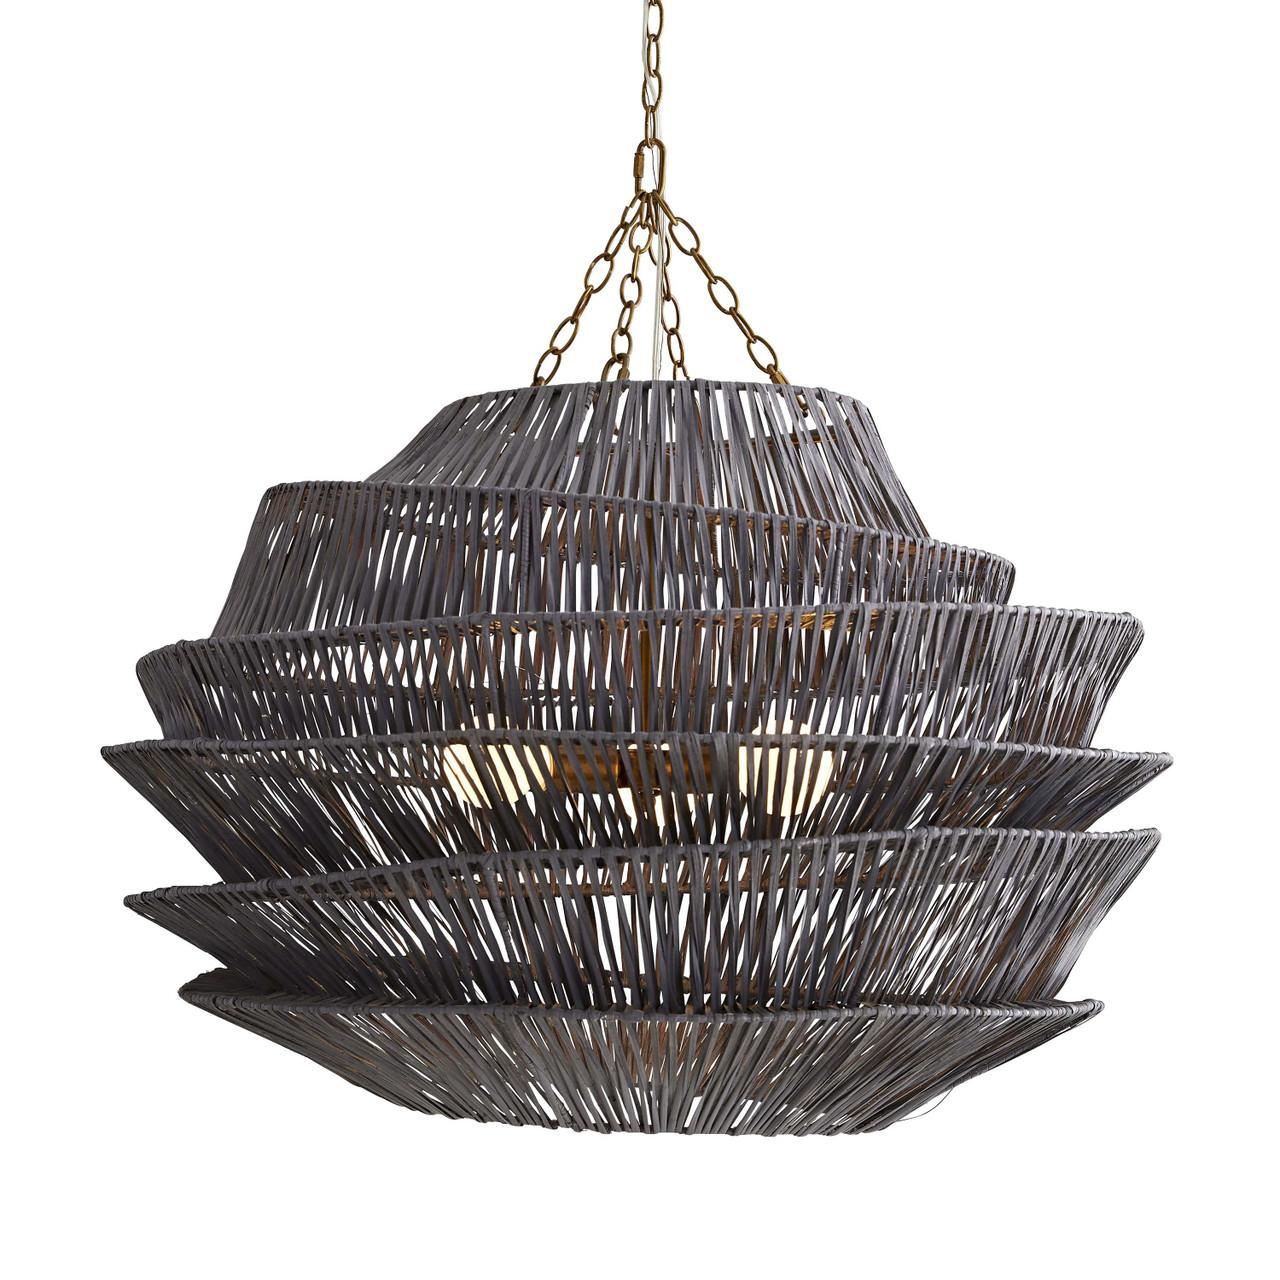 Banyan Pendant Dark Gray Wash, Antique Brass Iron